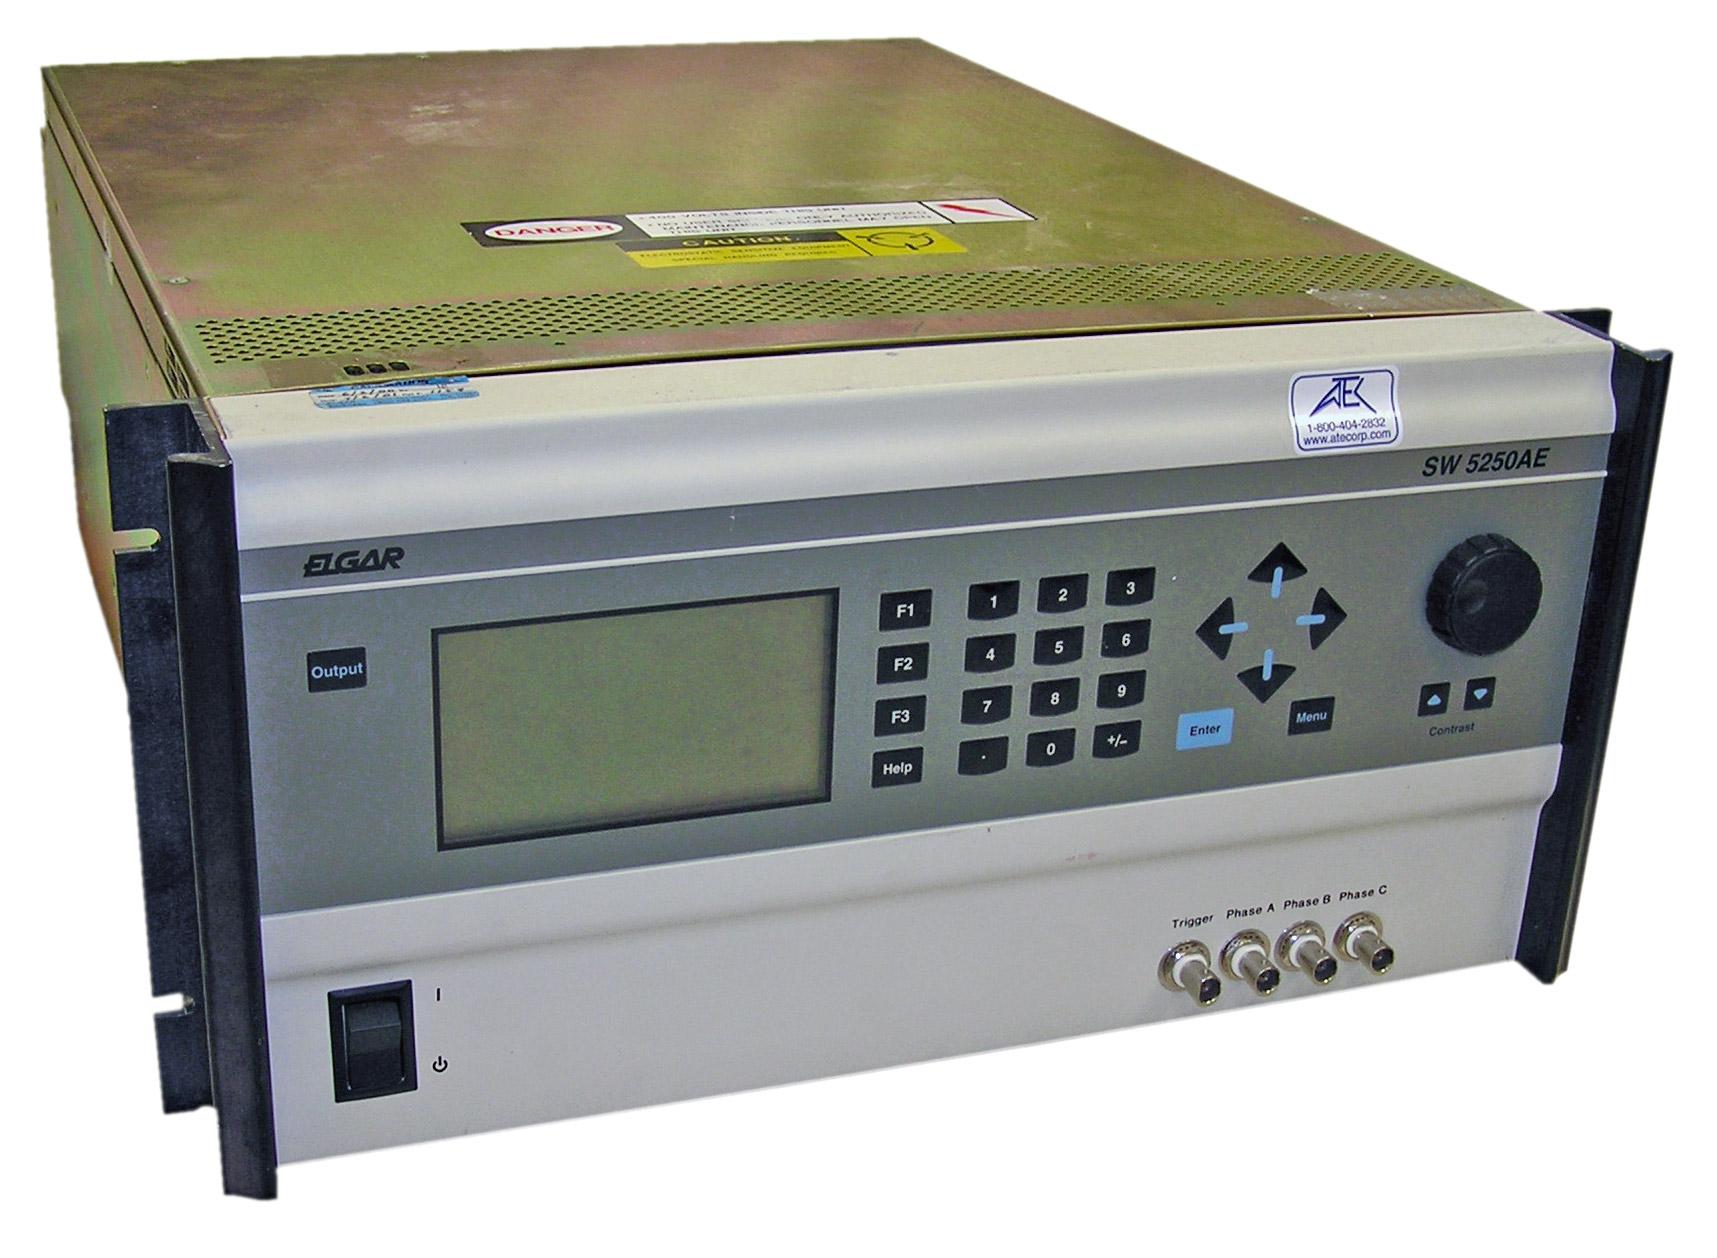 Ac Power Supply Atec Rentals We Can Configure Them As A Lowvoltage Bipolar Elgar Sw5250ae 4